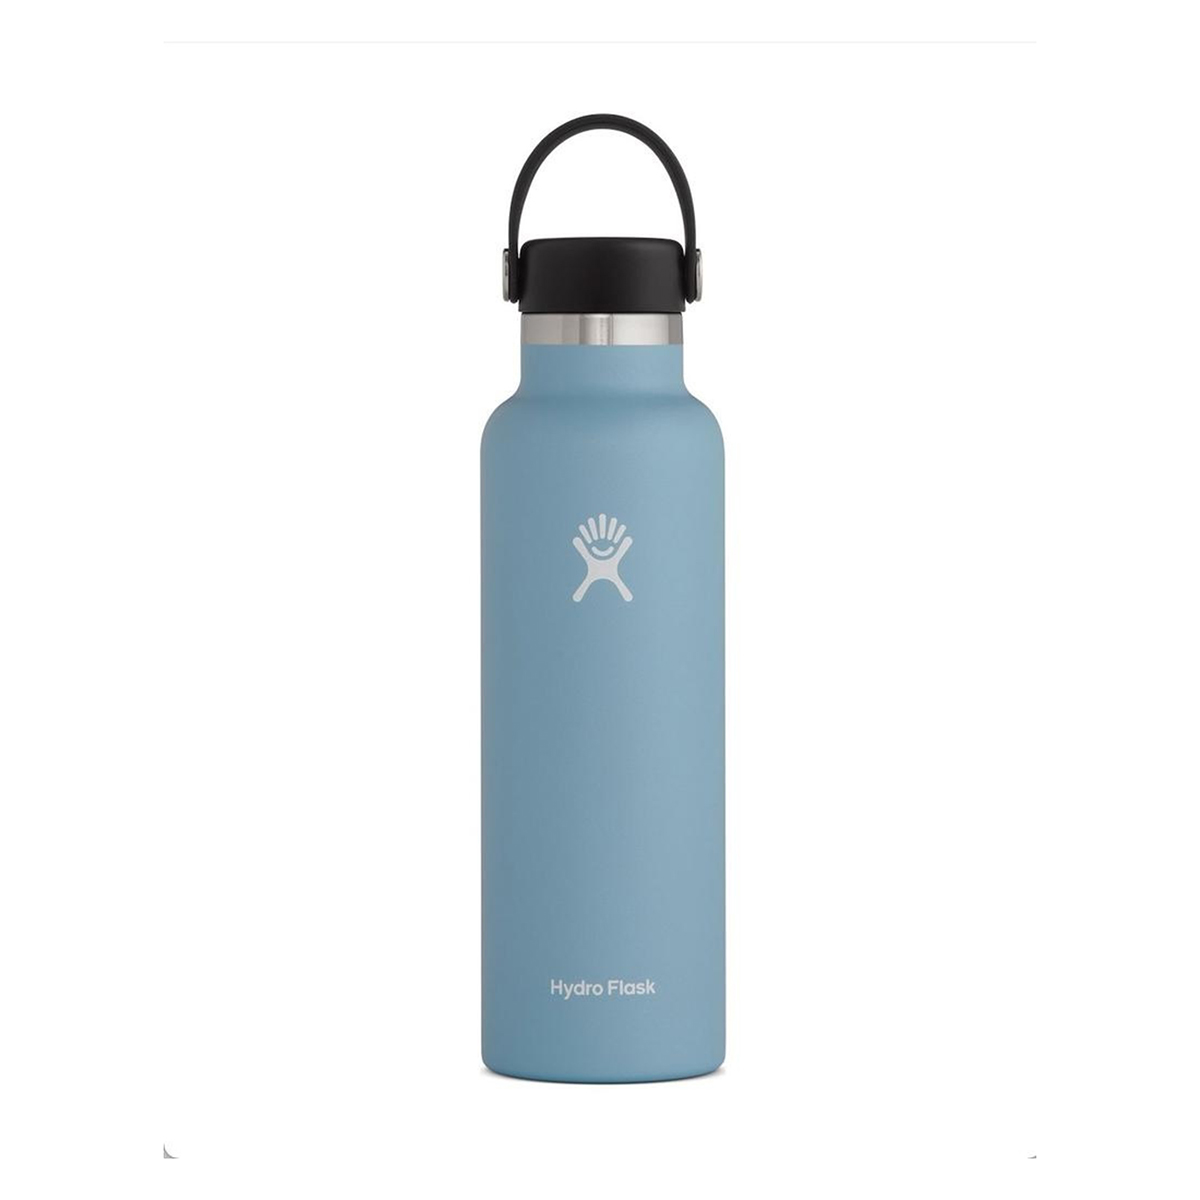 Hydro Flask 21 oz Standard Mouth Water Bottle - Color: Rain, Rain, large, image 1